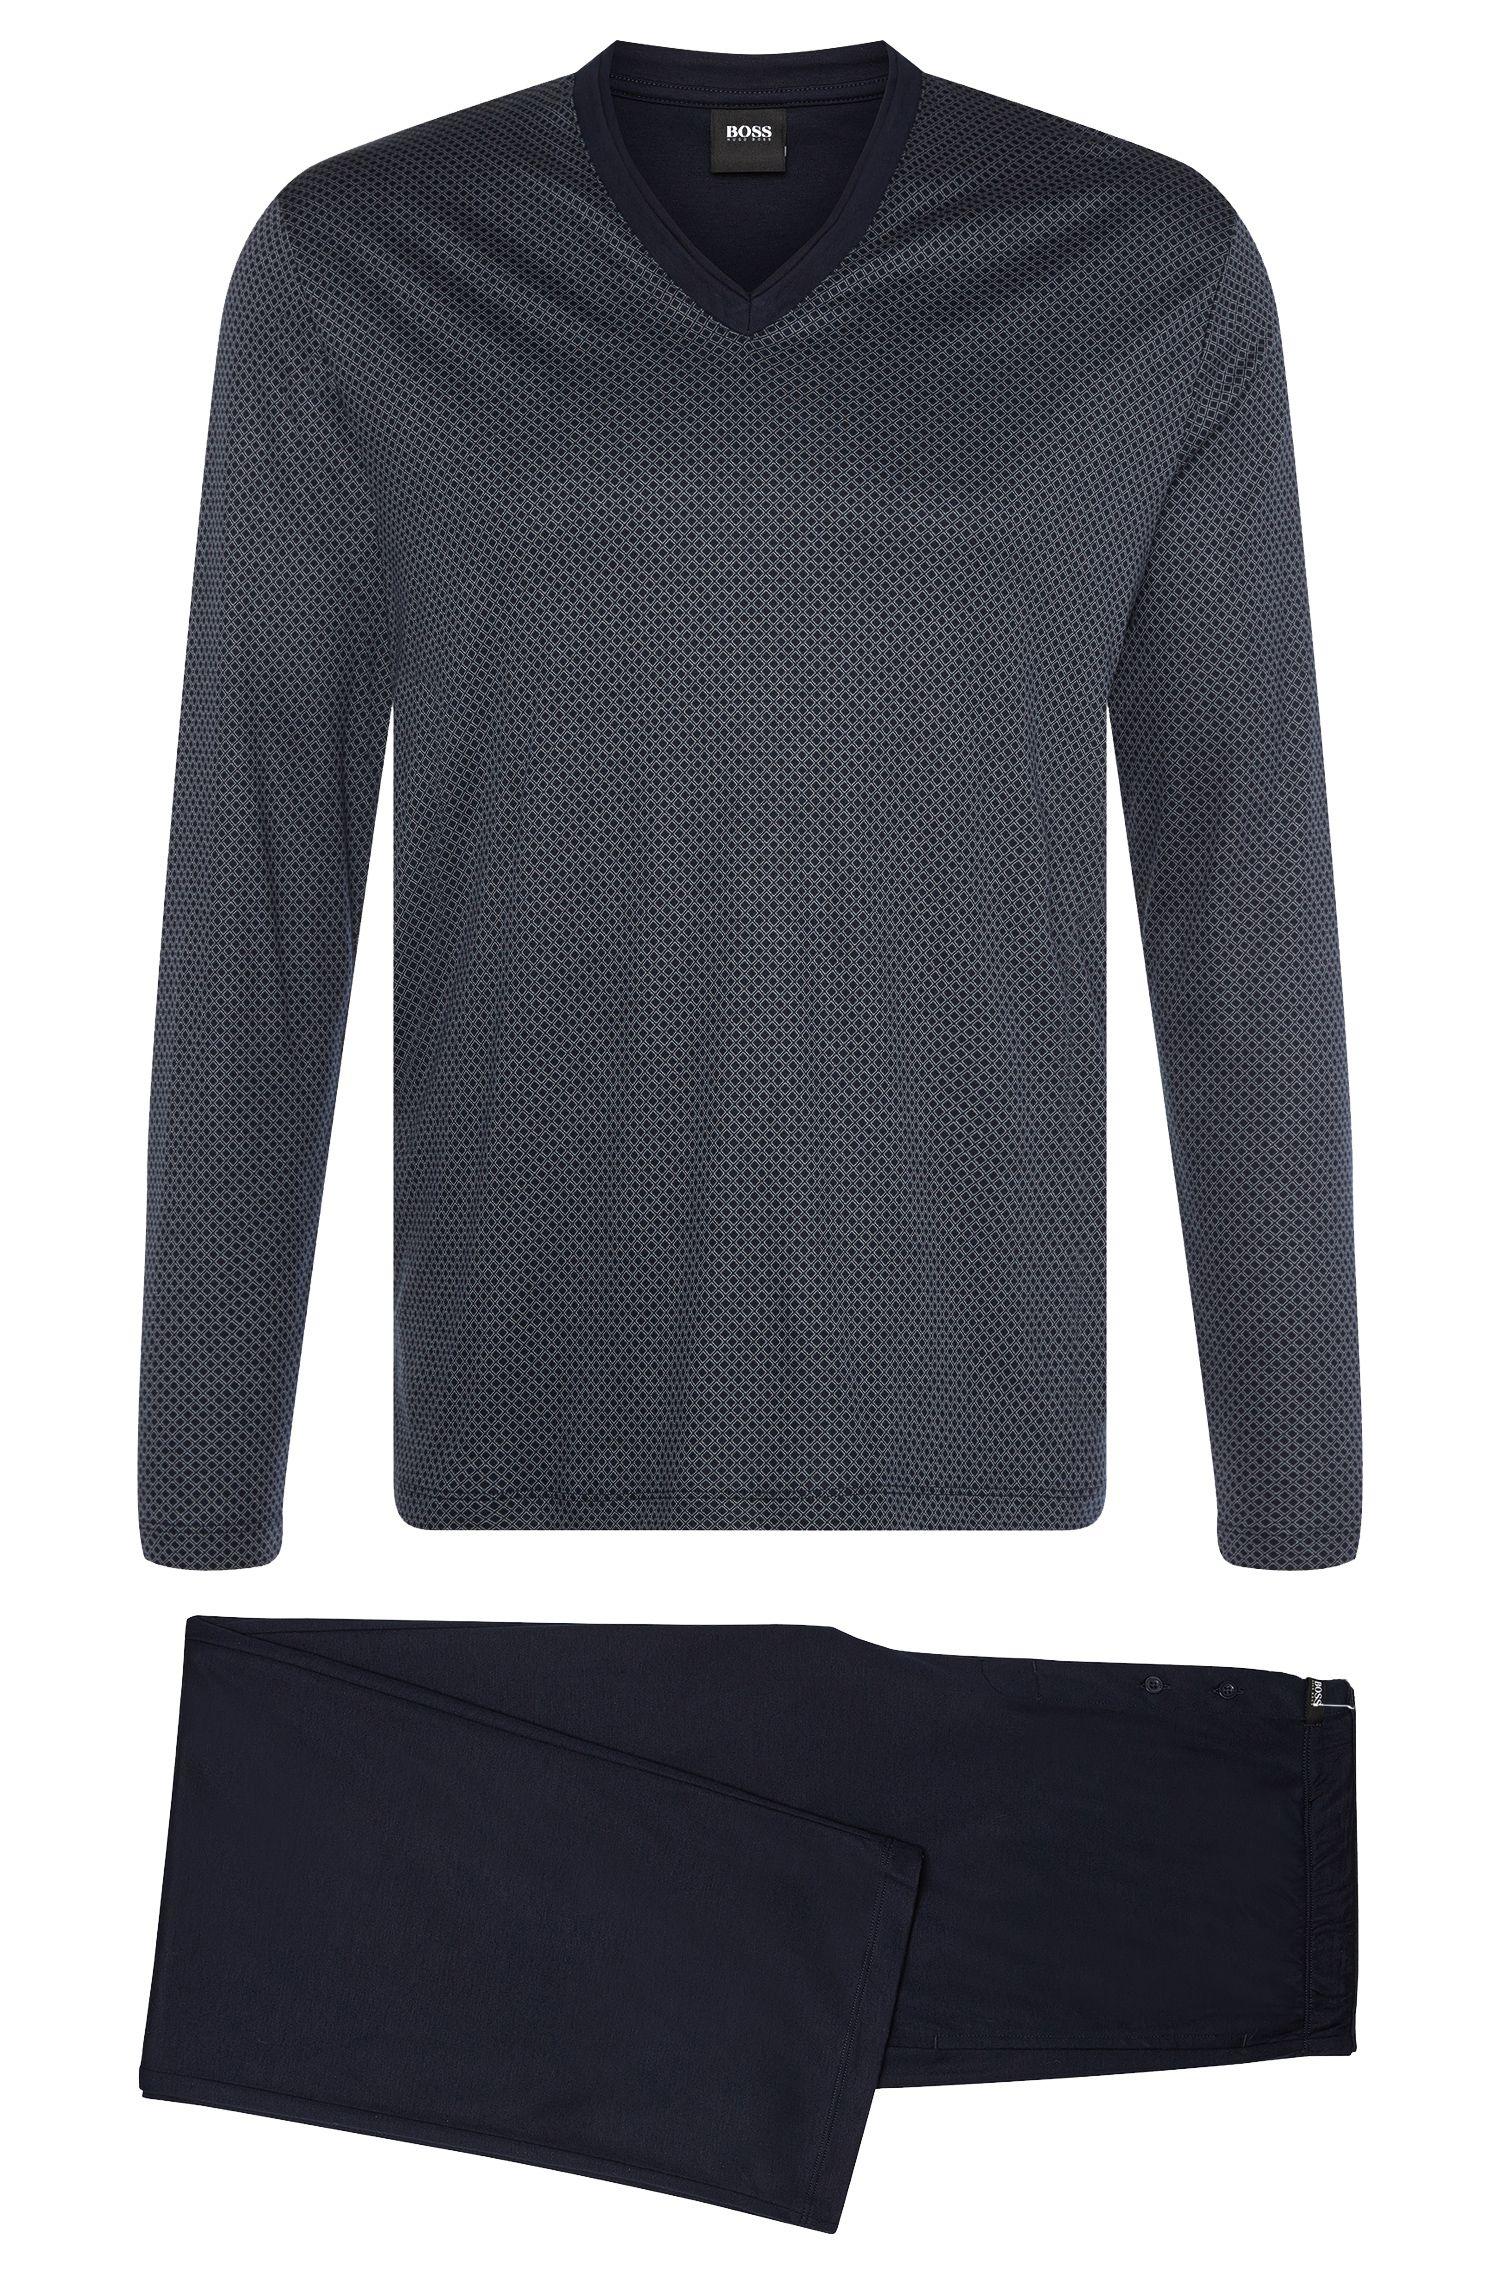 'Set Long Jersey' | Cotton Modal Loungewear Set